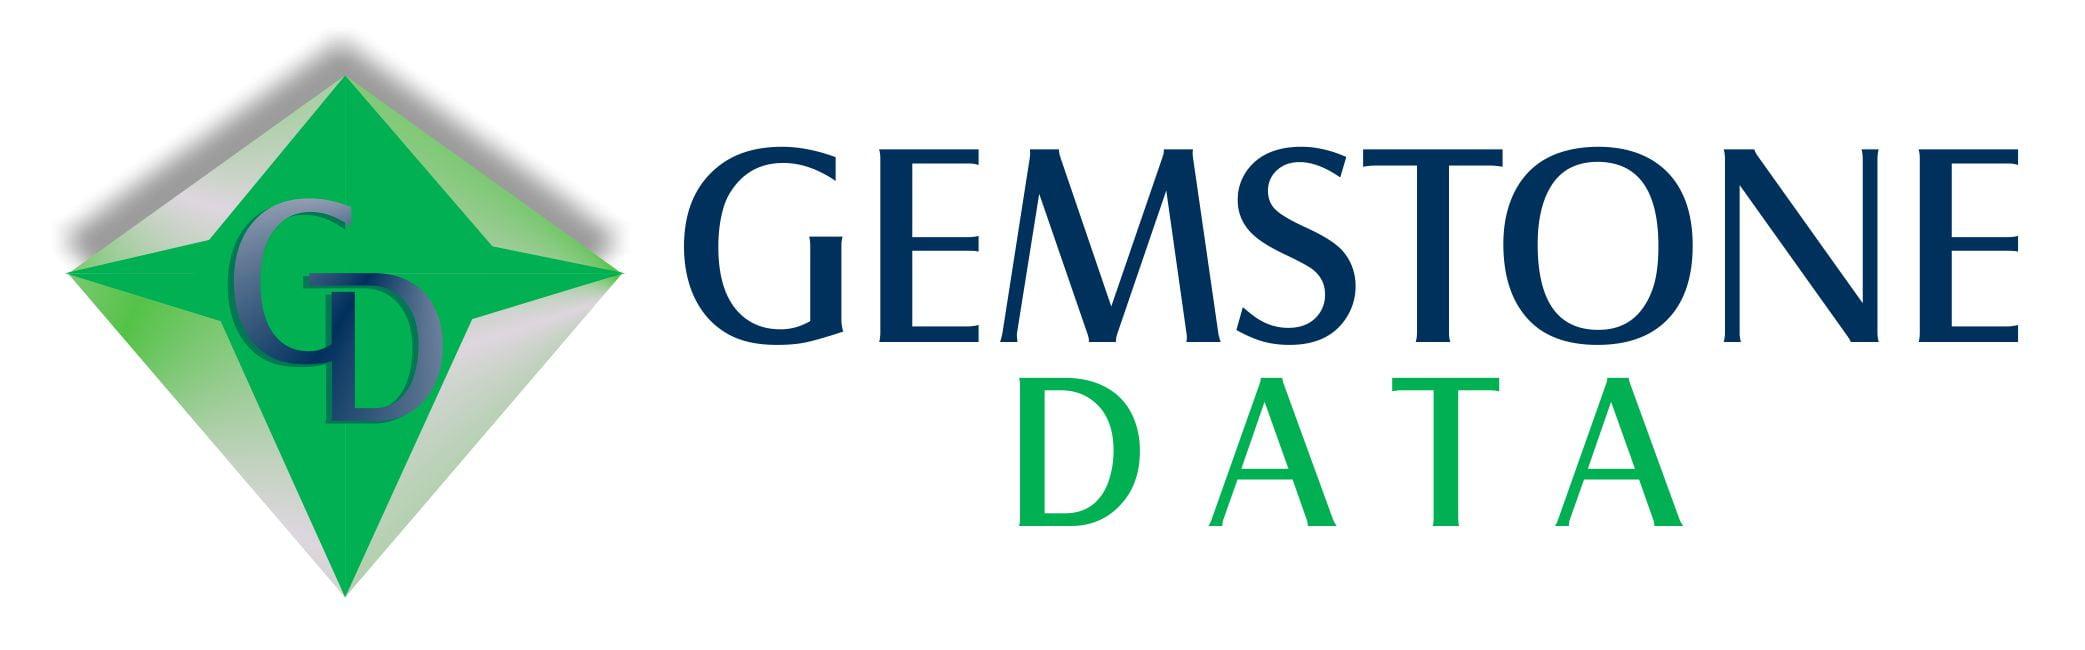 Gemstone Data